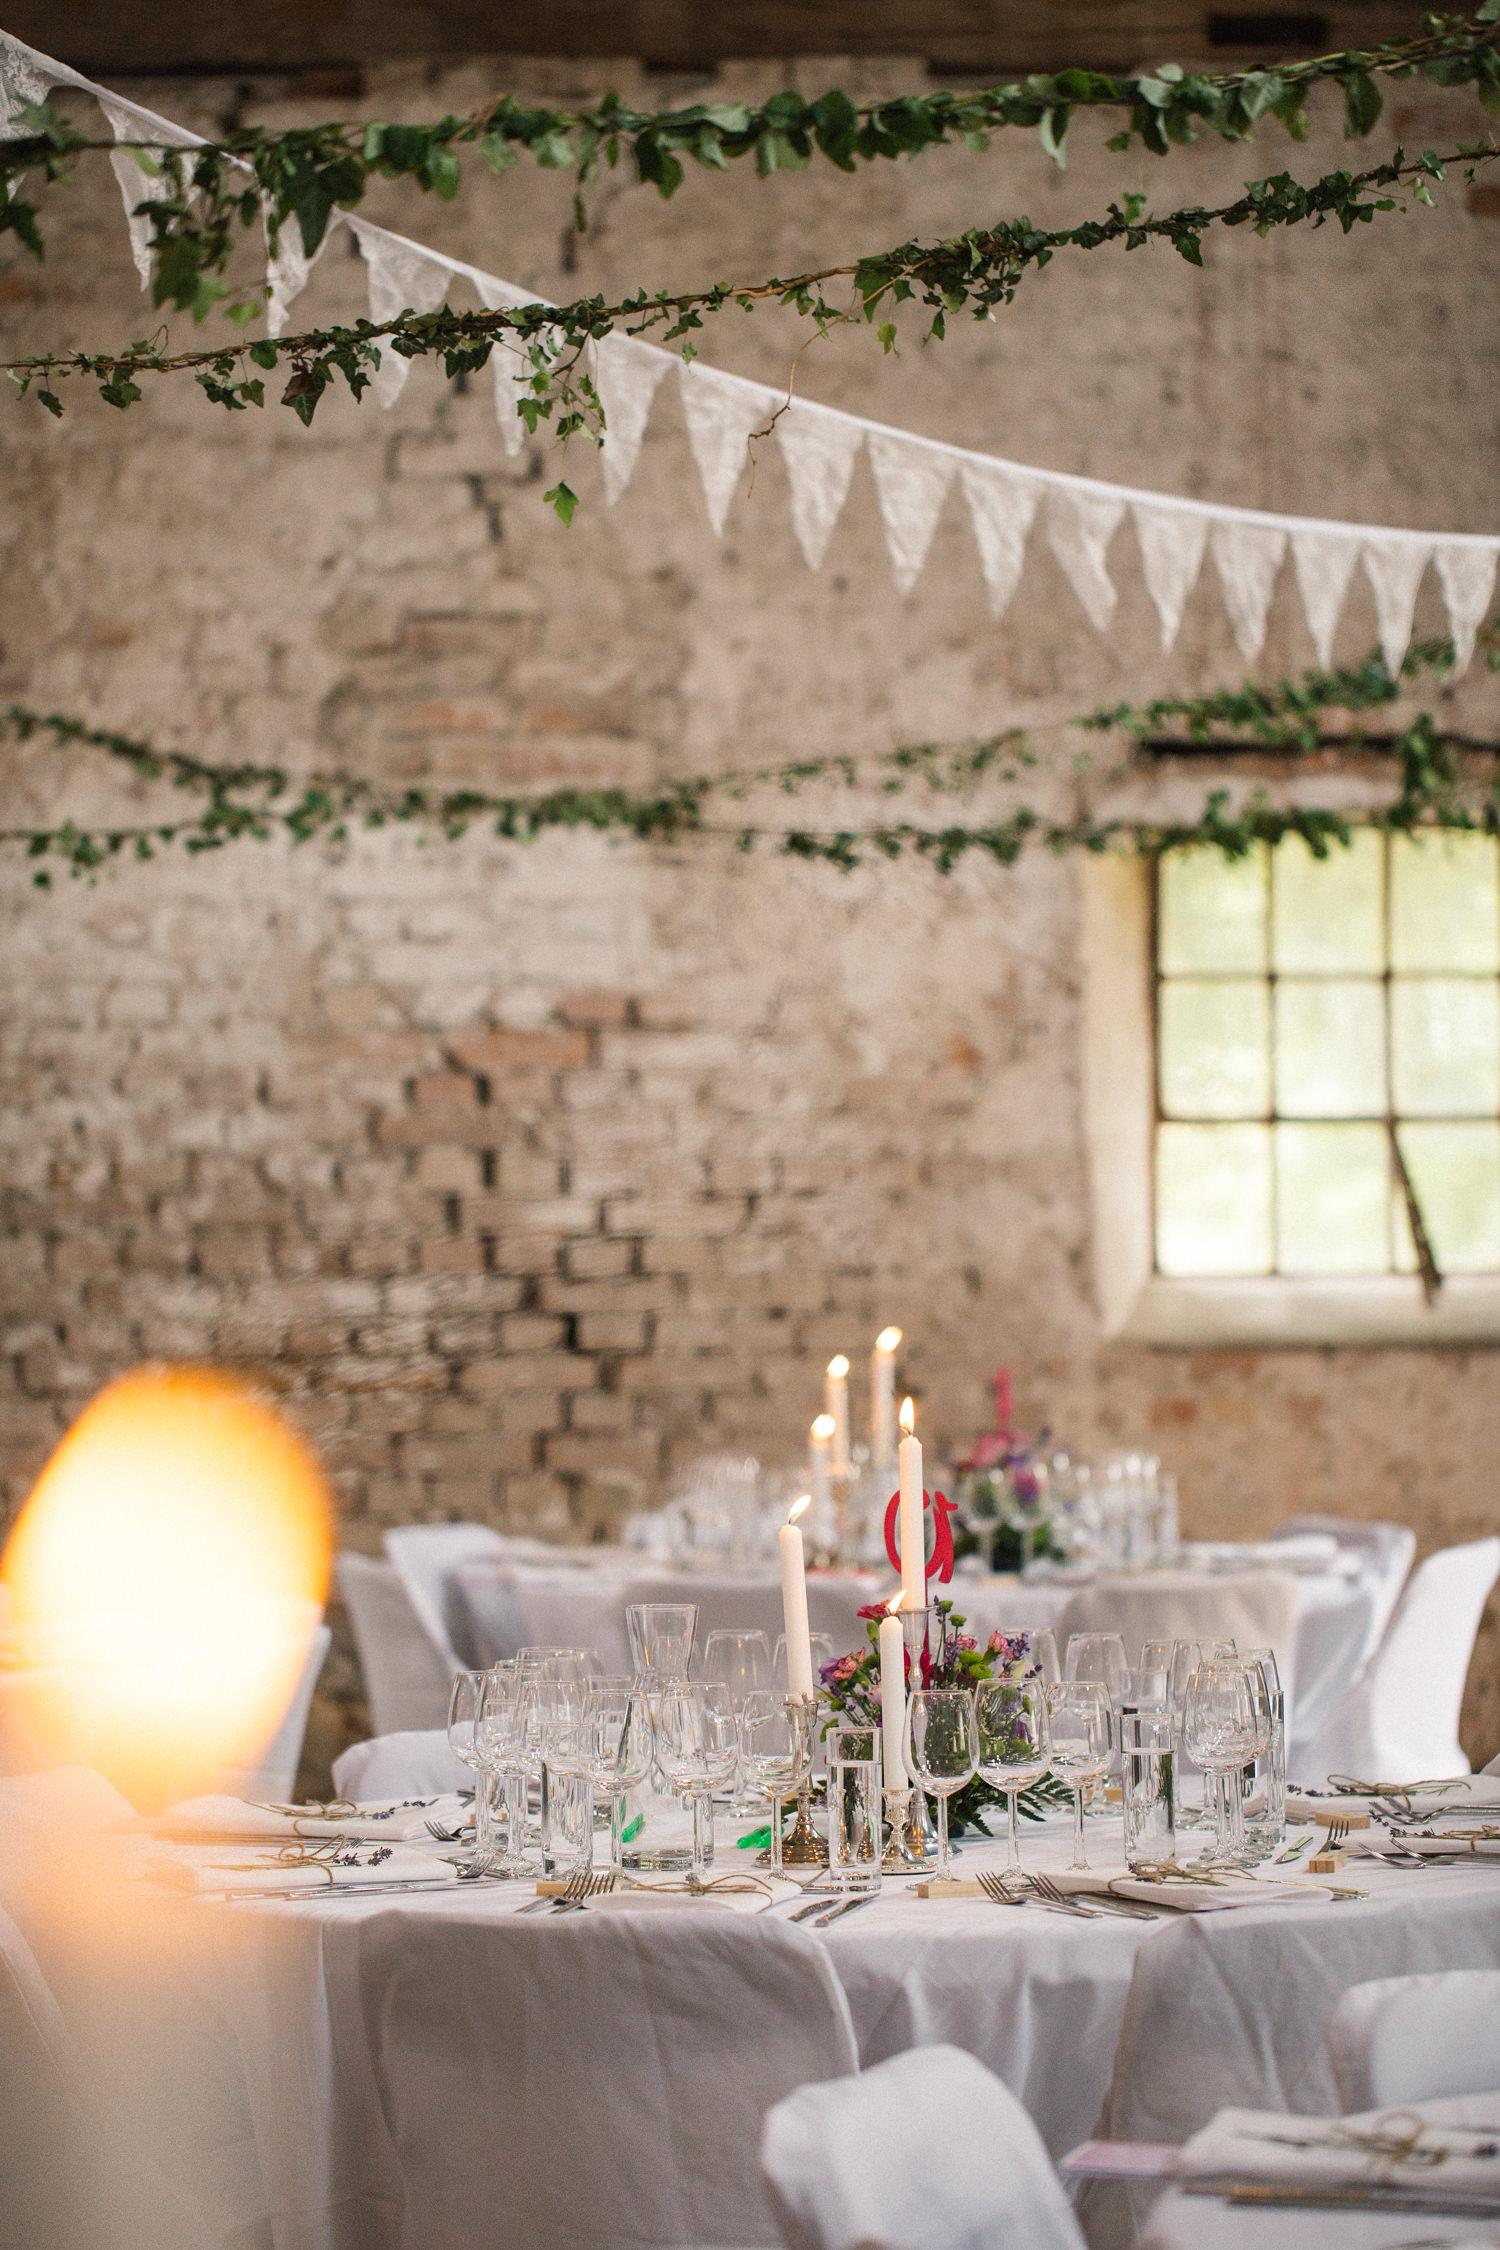 Brudparets egna bröllopsdukning på Borgeby Slott i Skåne. Fotograf är Tove Lundquist.